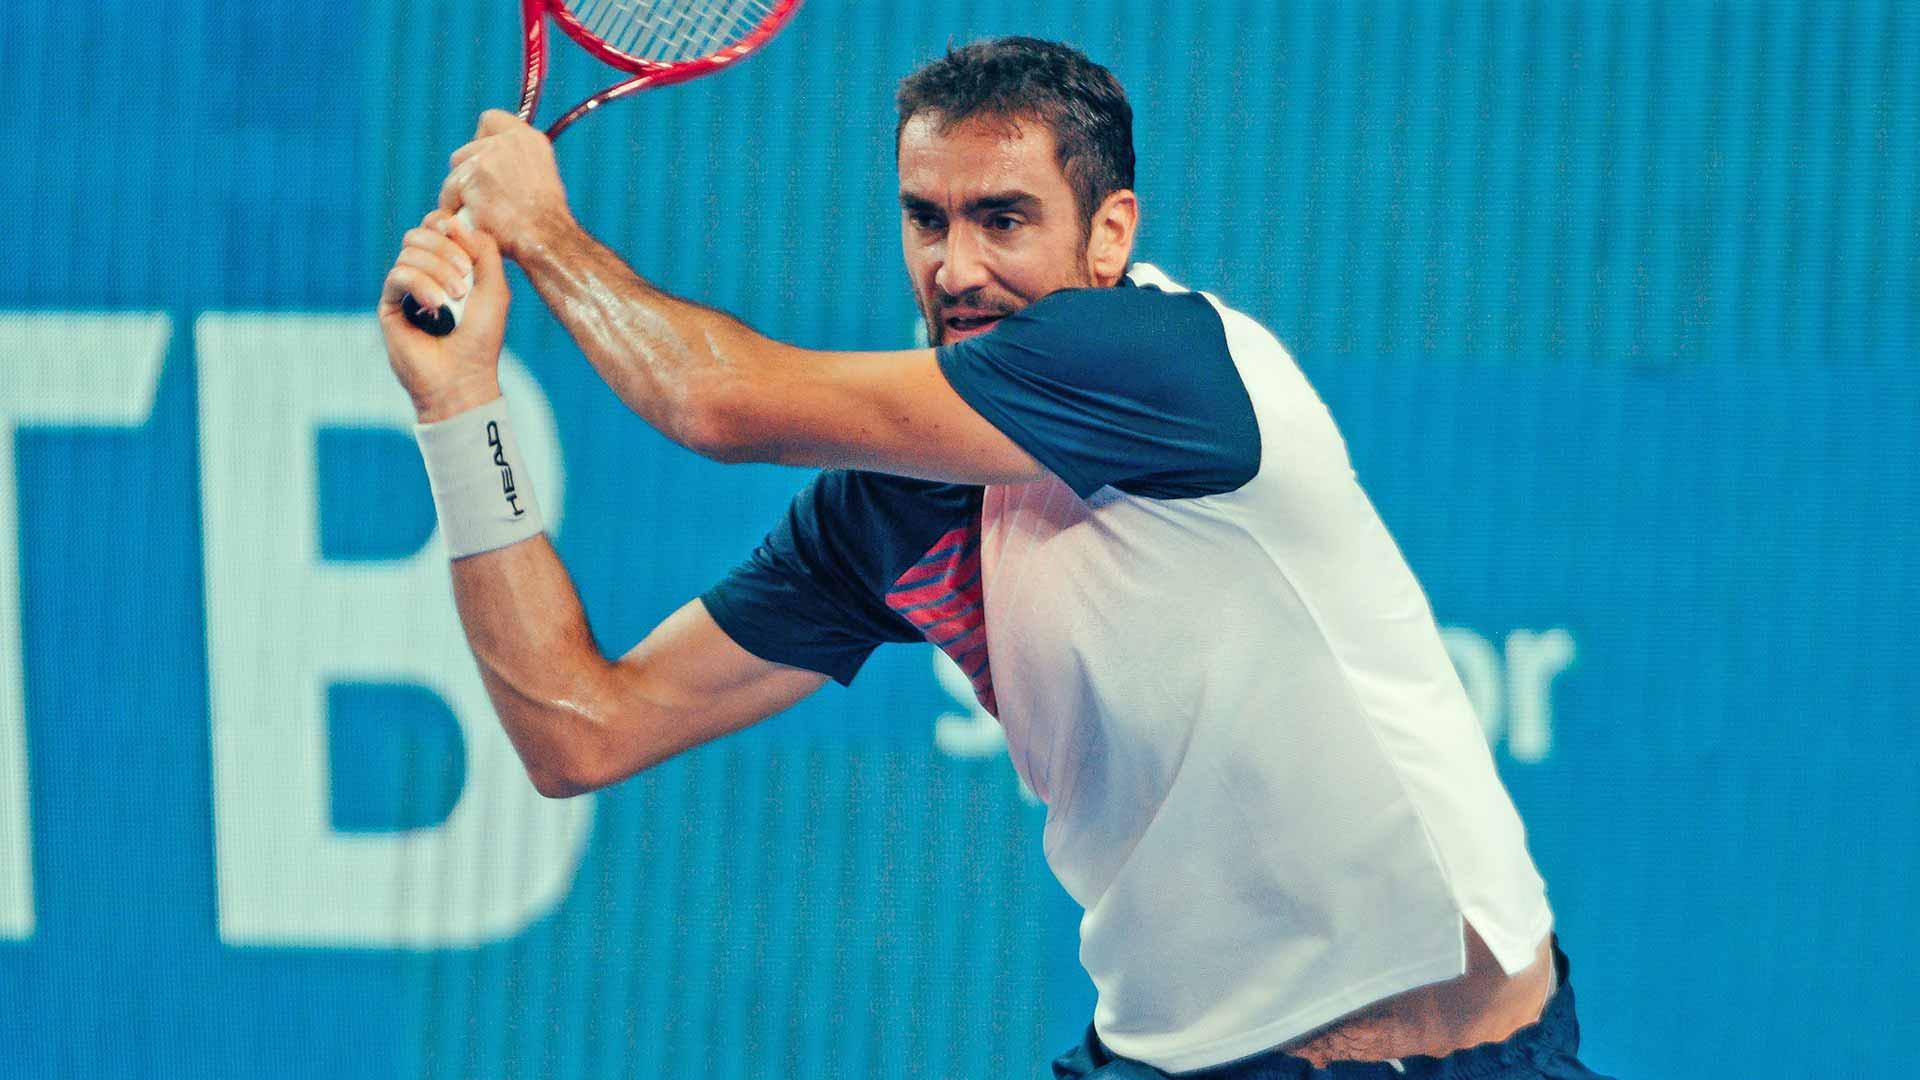 Karen Khachanov recovers, Marin Cilic advances in Moscow |  ATP tour